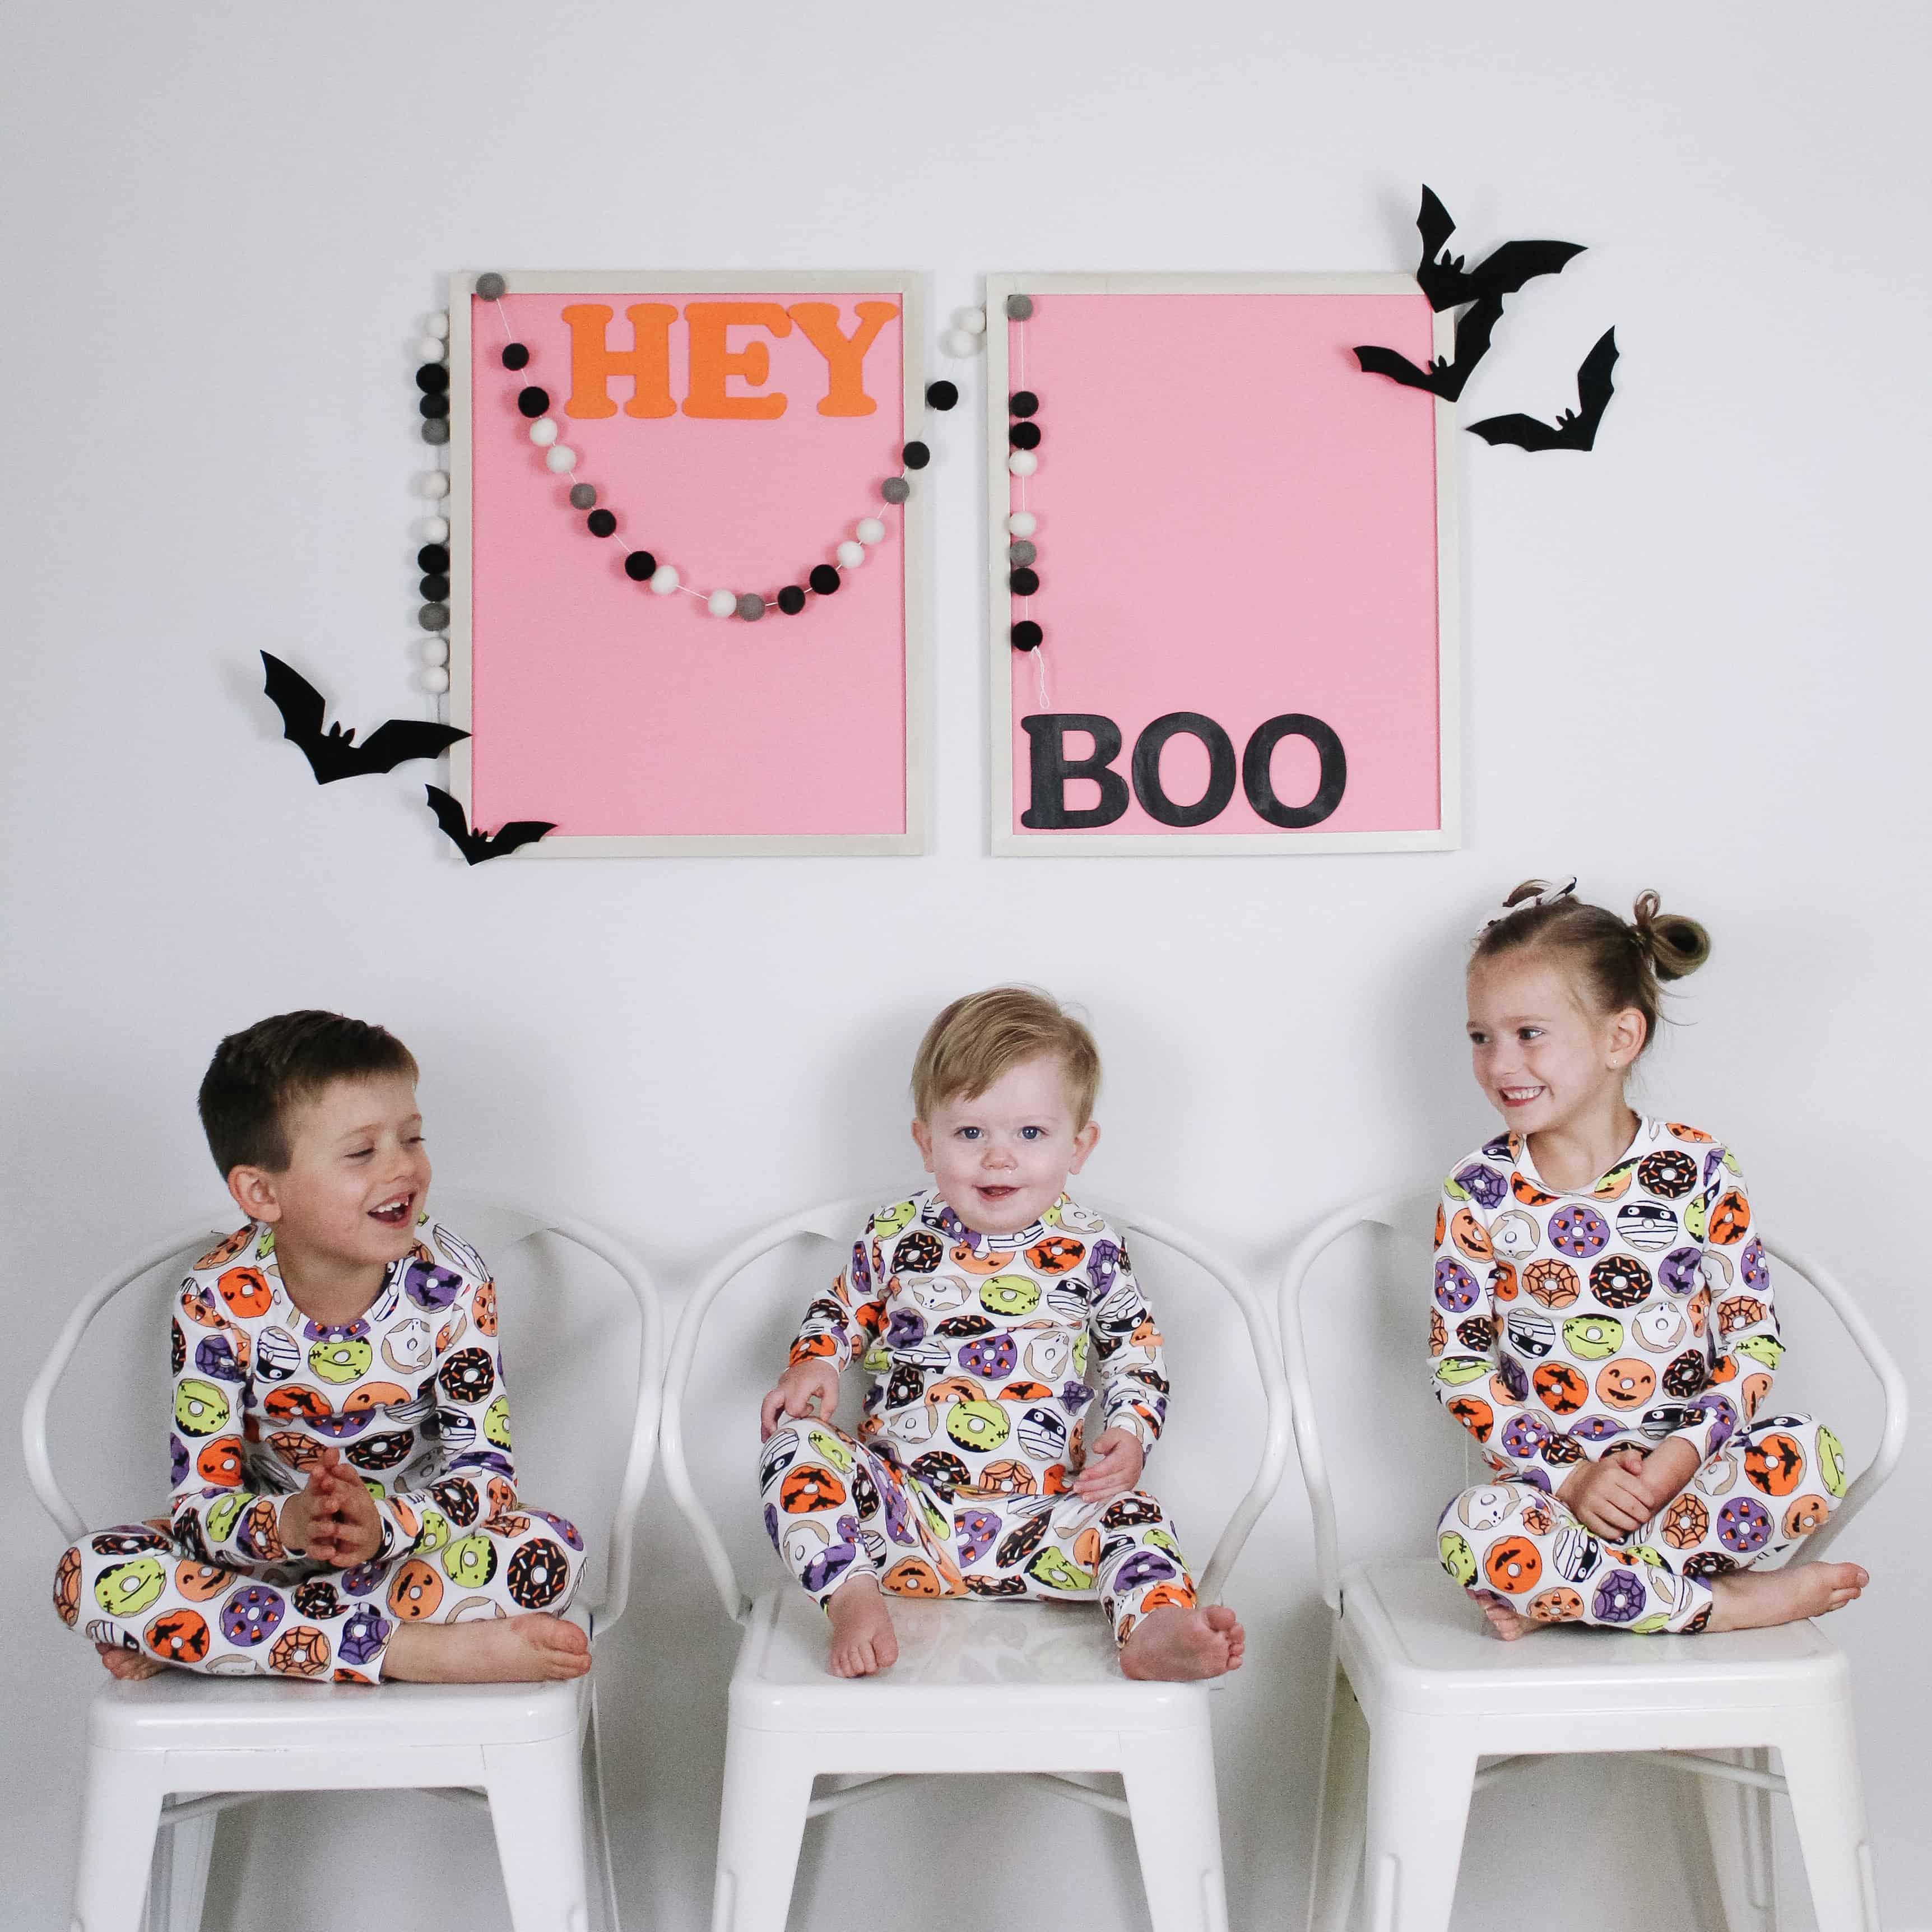 kids in Halloween pjs